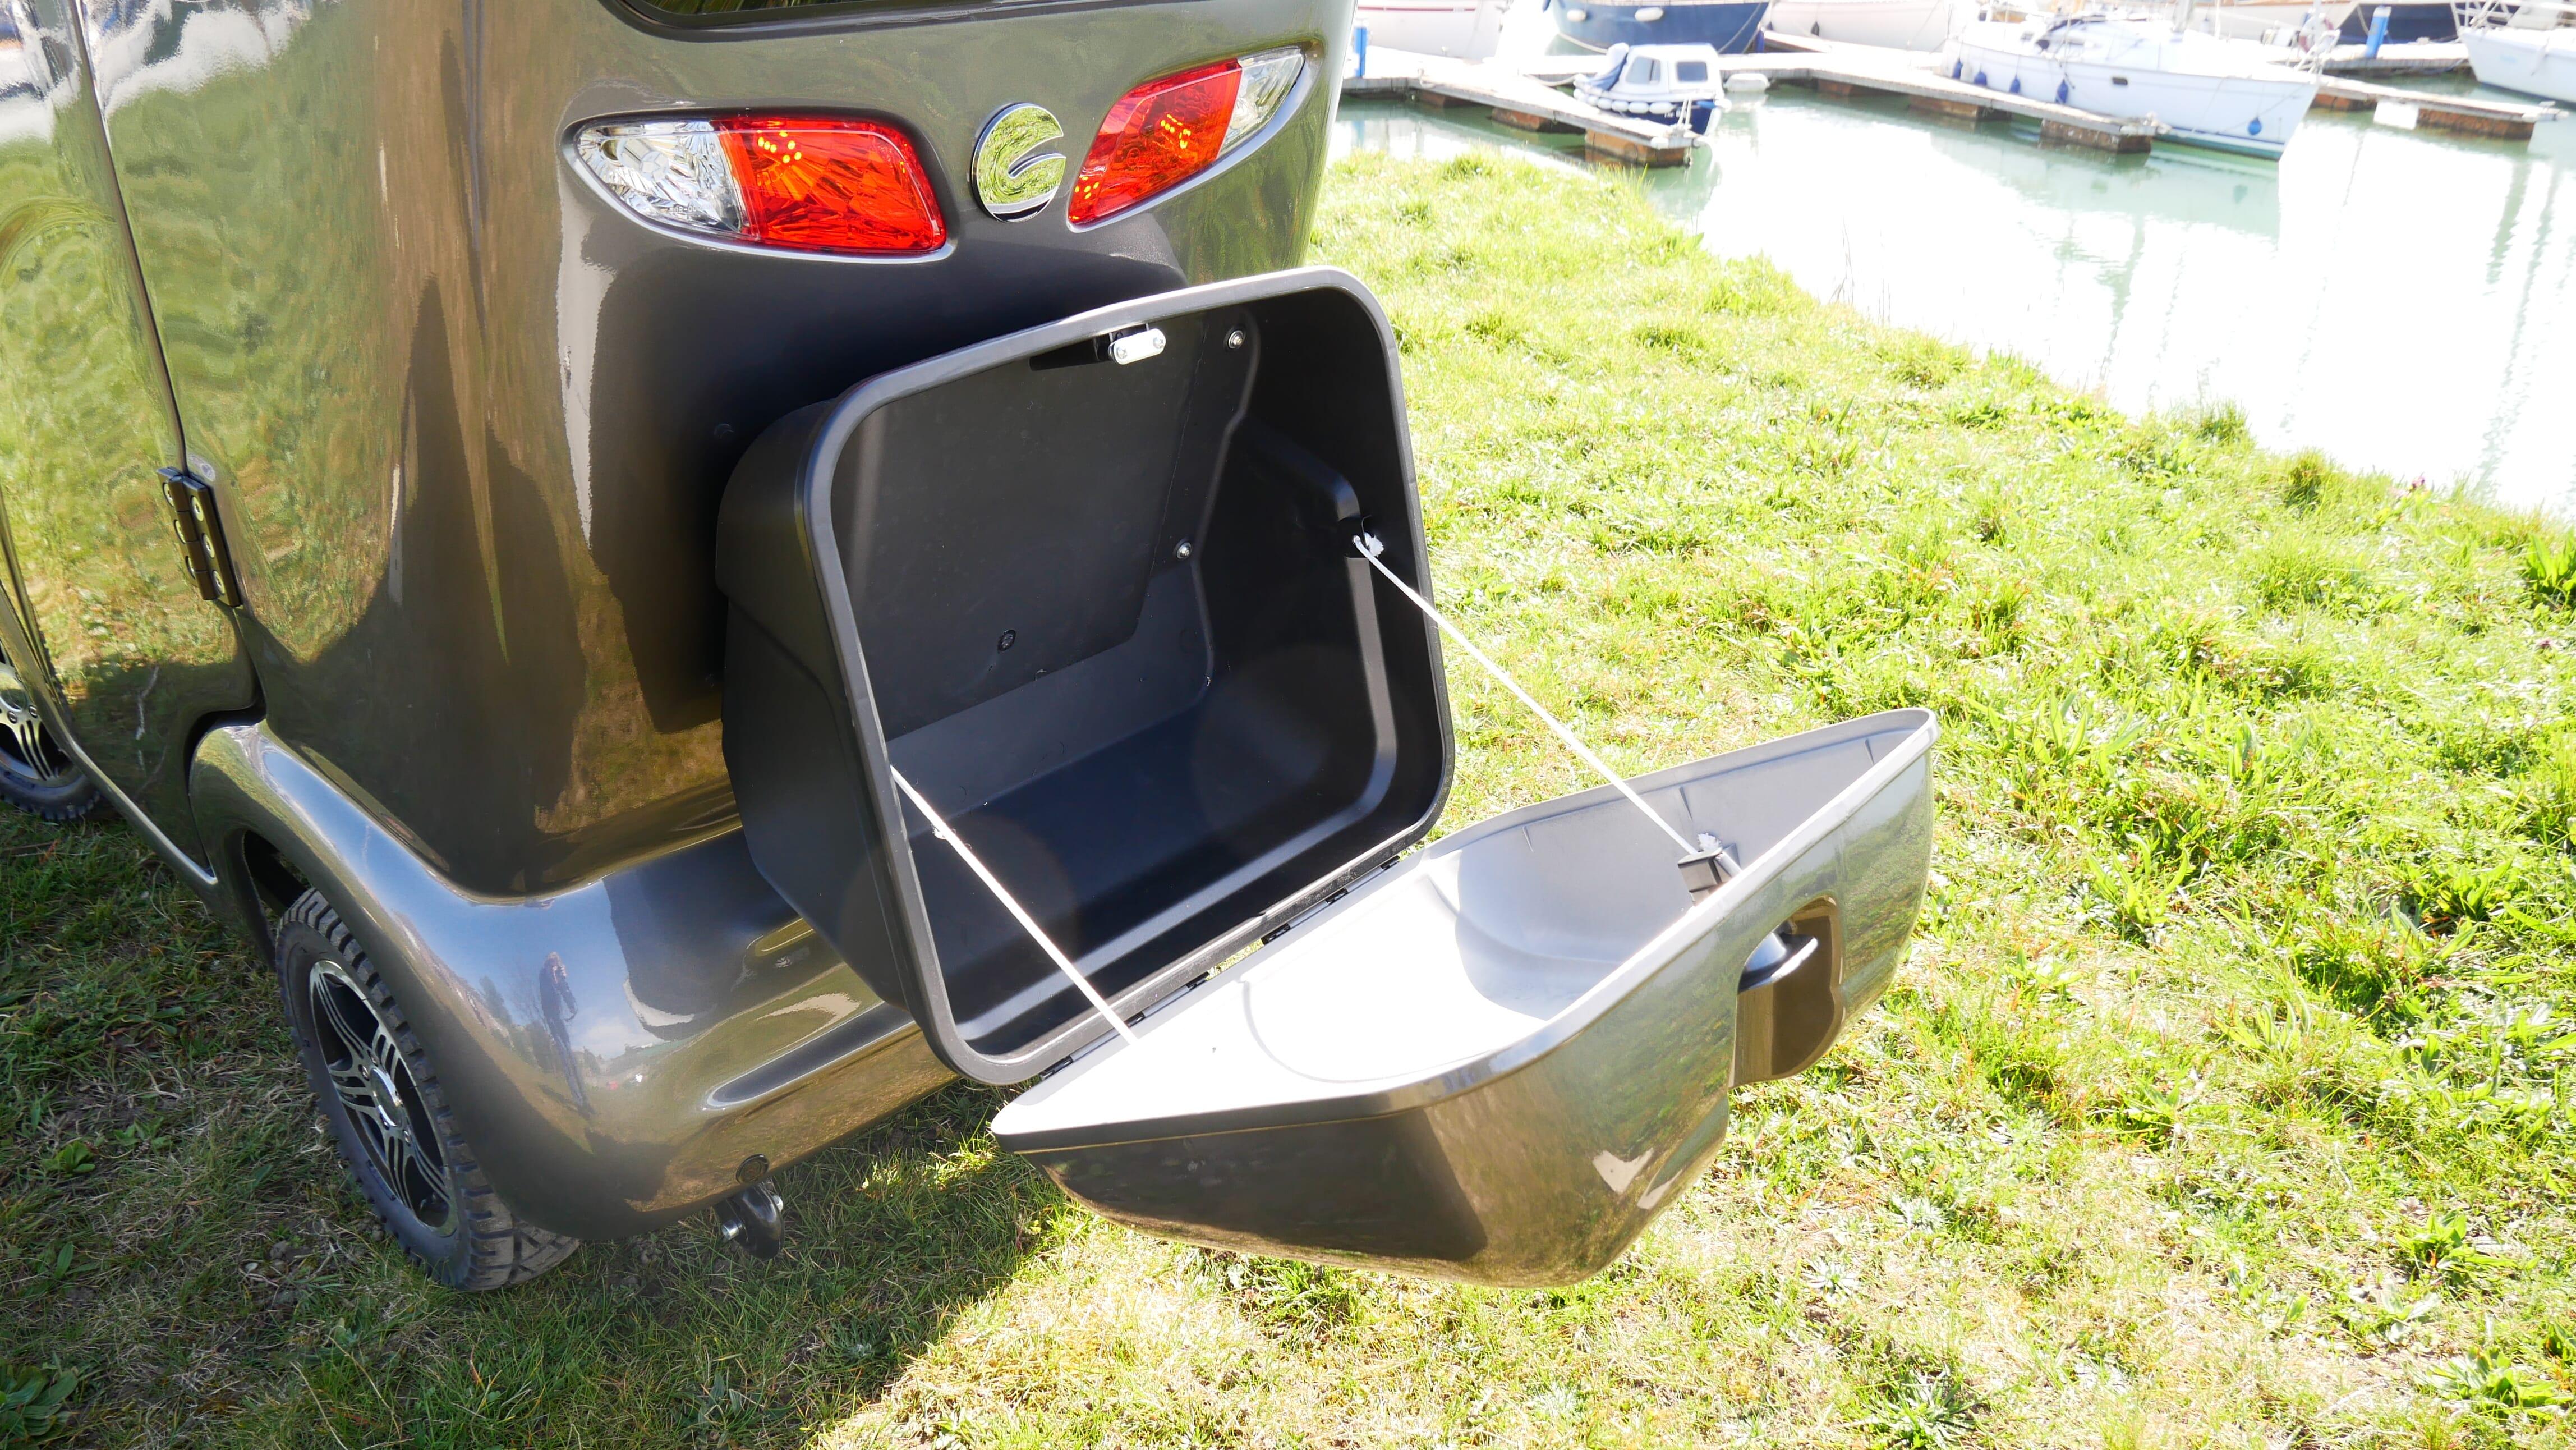 Scooterpac Cabin Car lockable storage box open